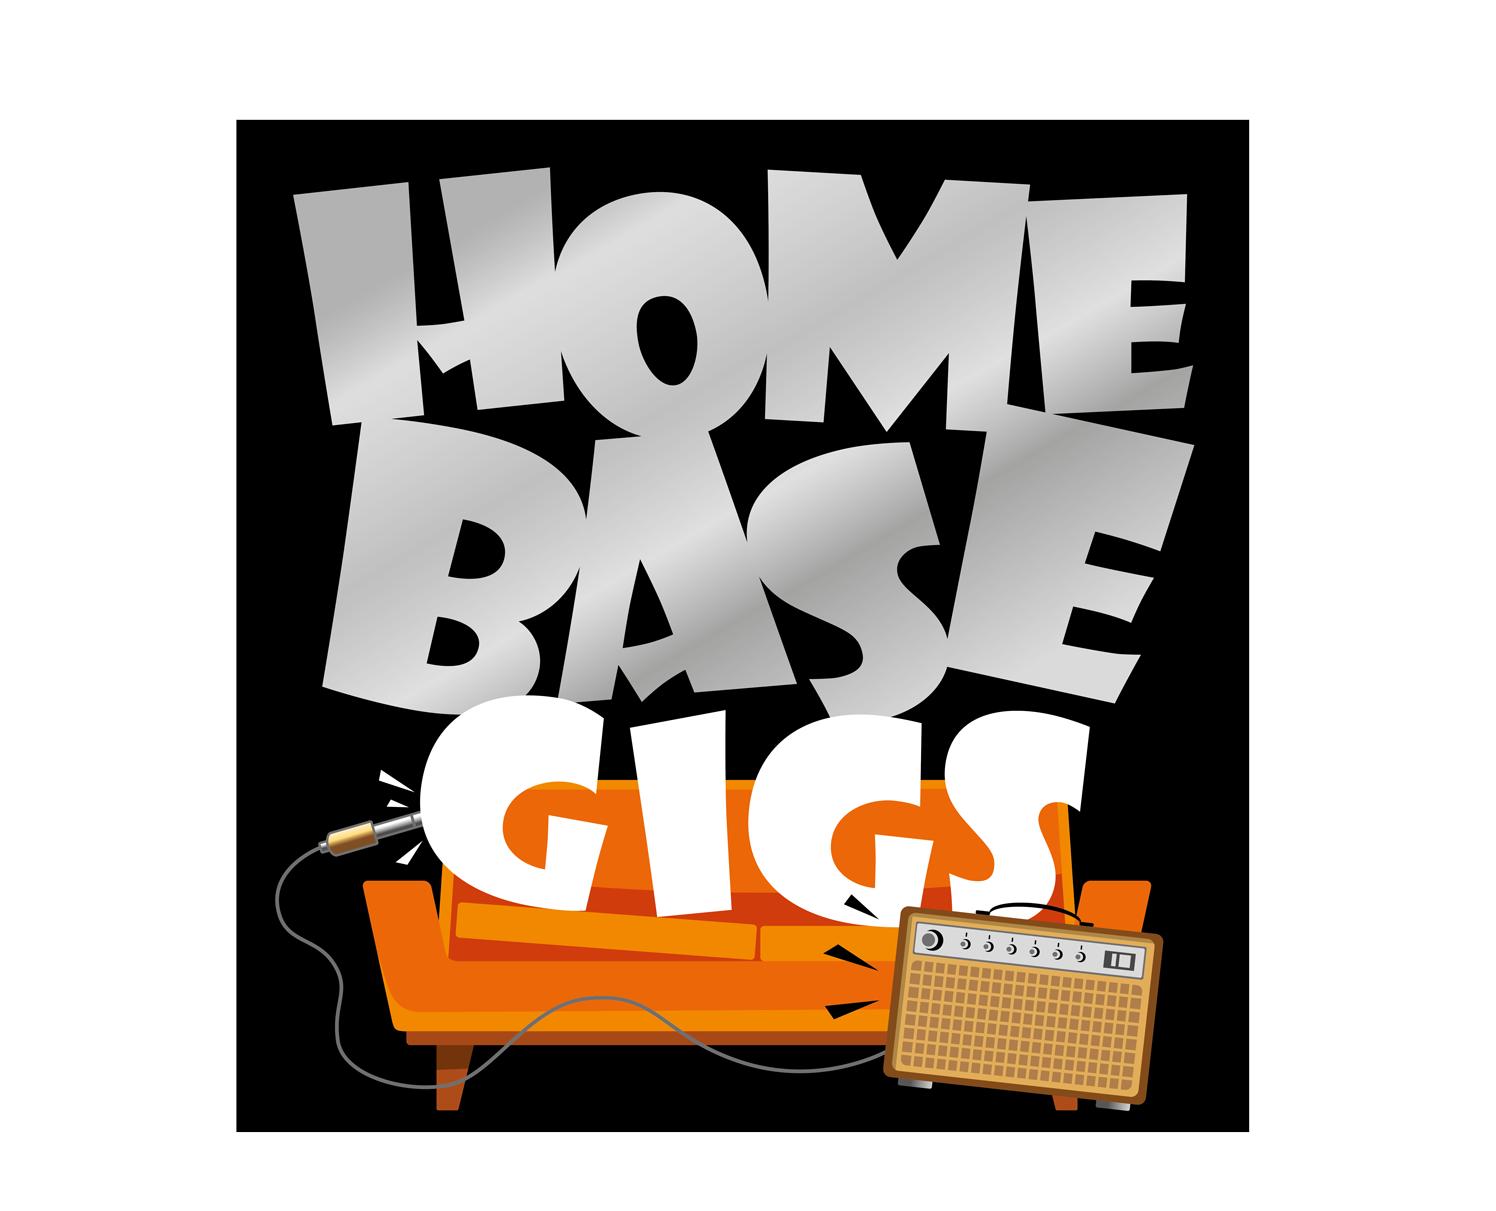 Logo_Homebase_Gigs_def